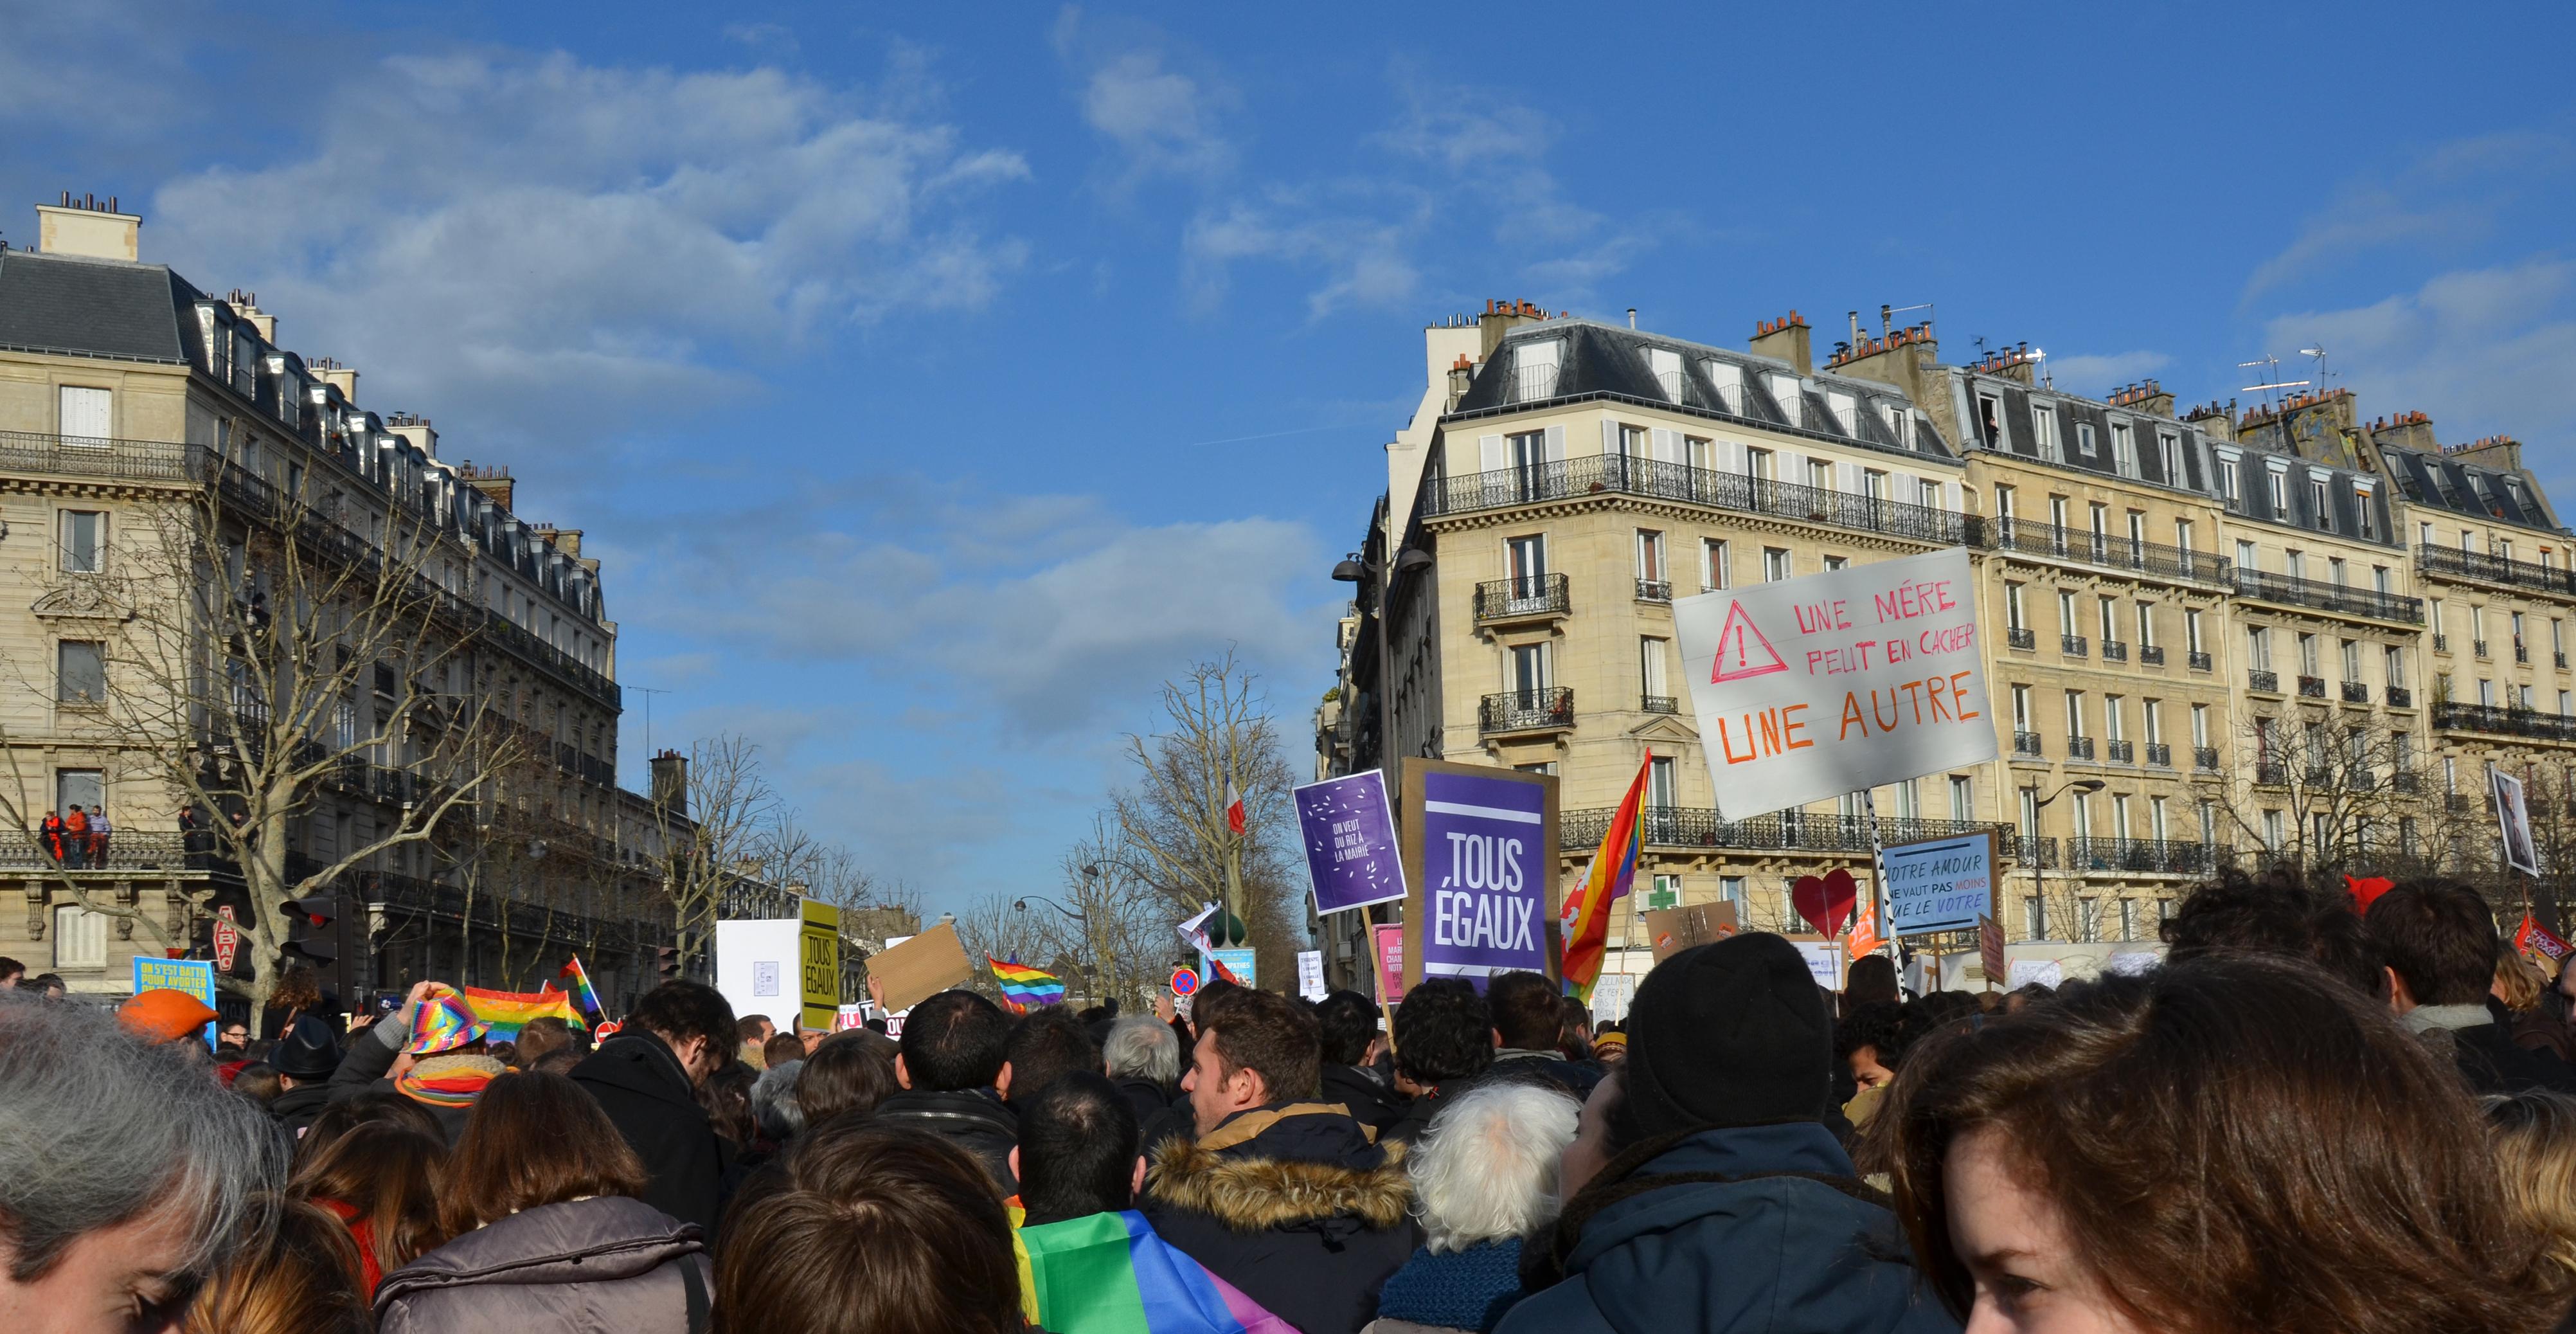 Rencontres Coquines Gay Sur St Etienne